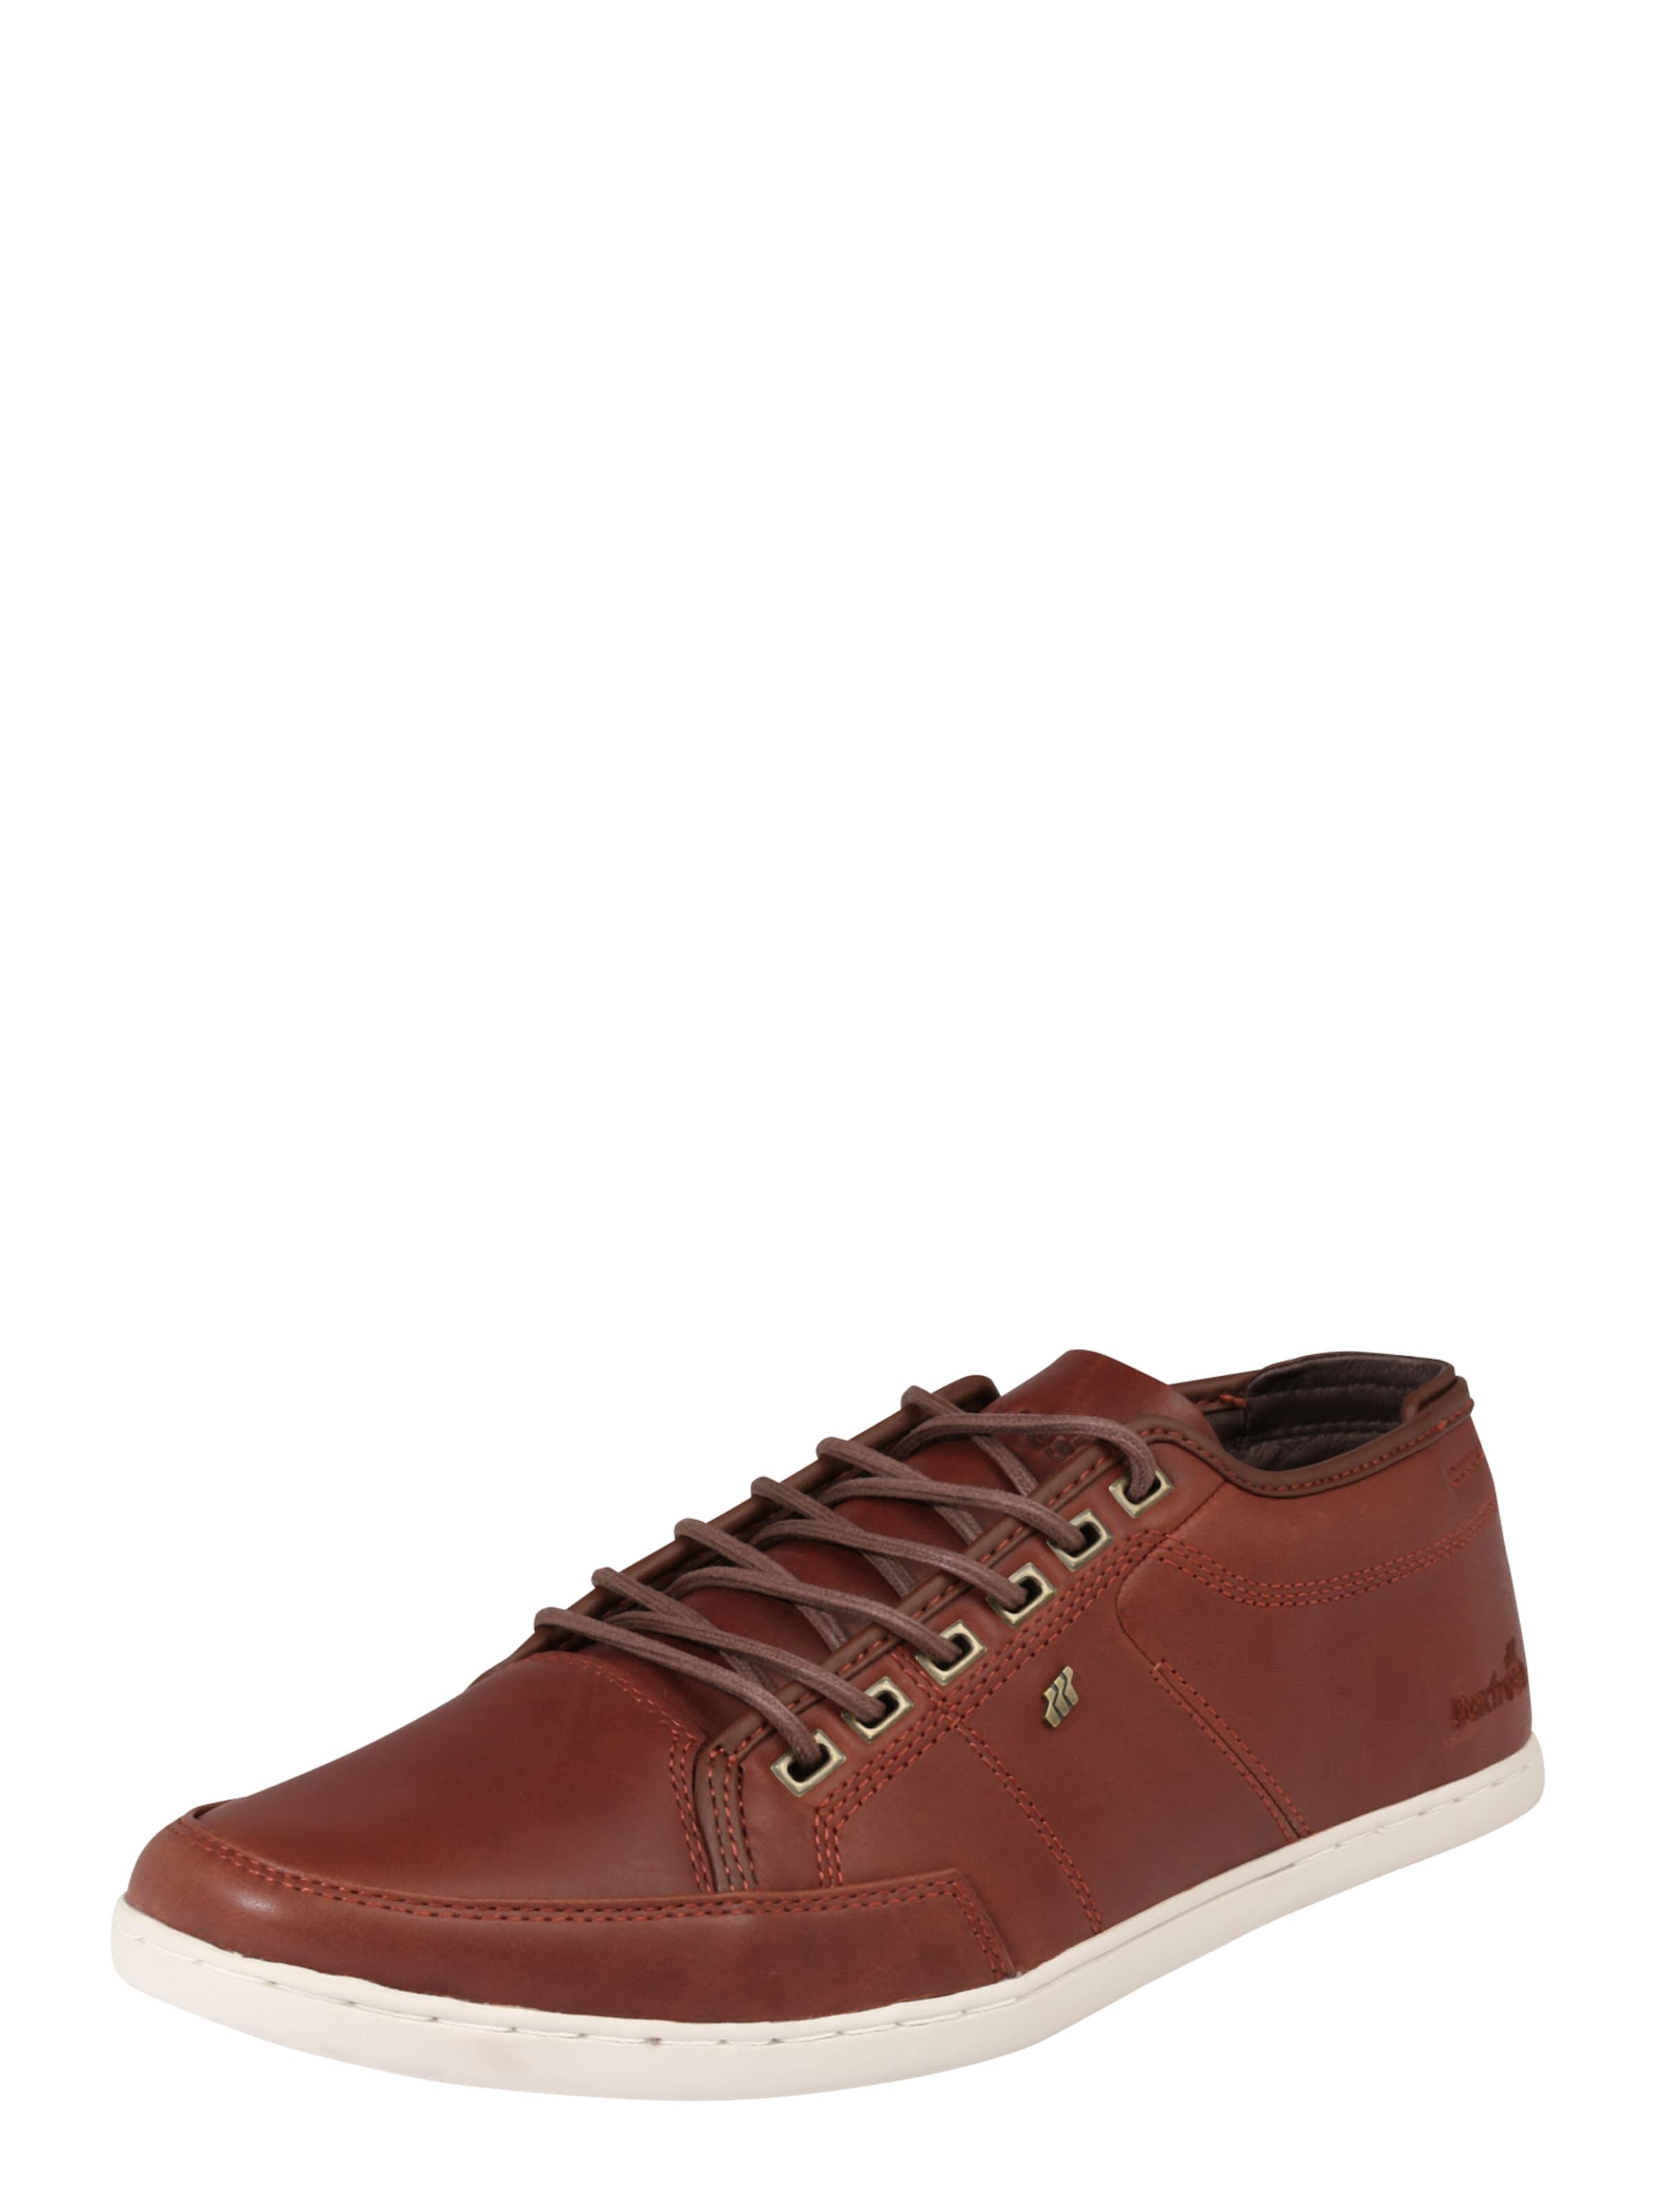 BOXFRESH Ledersneaker SPARKO Verschleißfeste LEA Verschleißfeste SPARKO billige Schuhe 6fe842